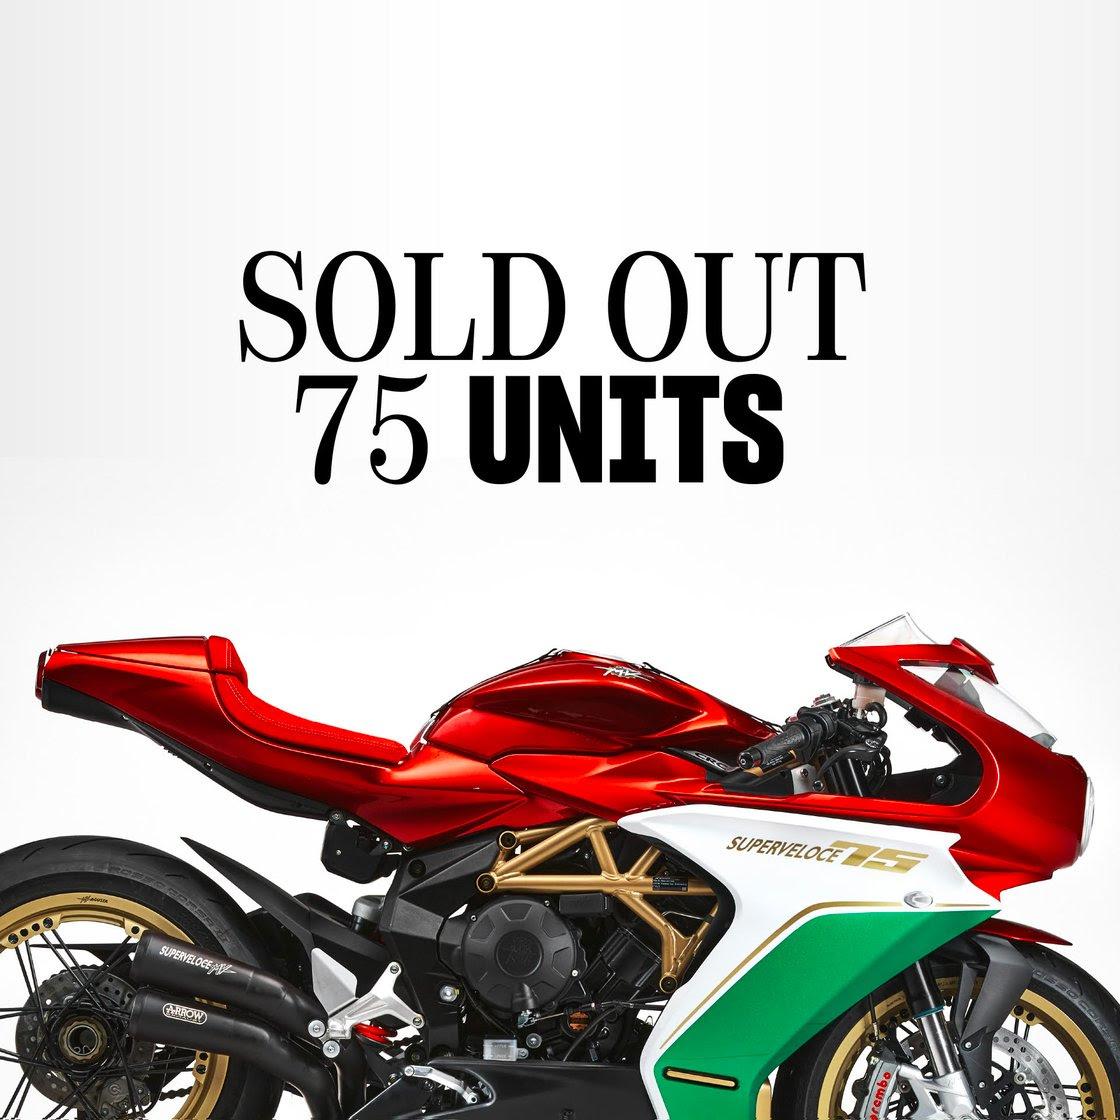 Superveloce 75 Anniversario sold out-1